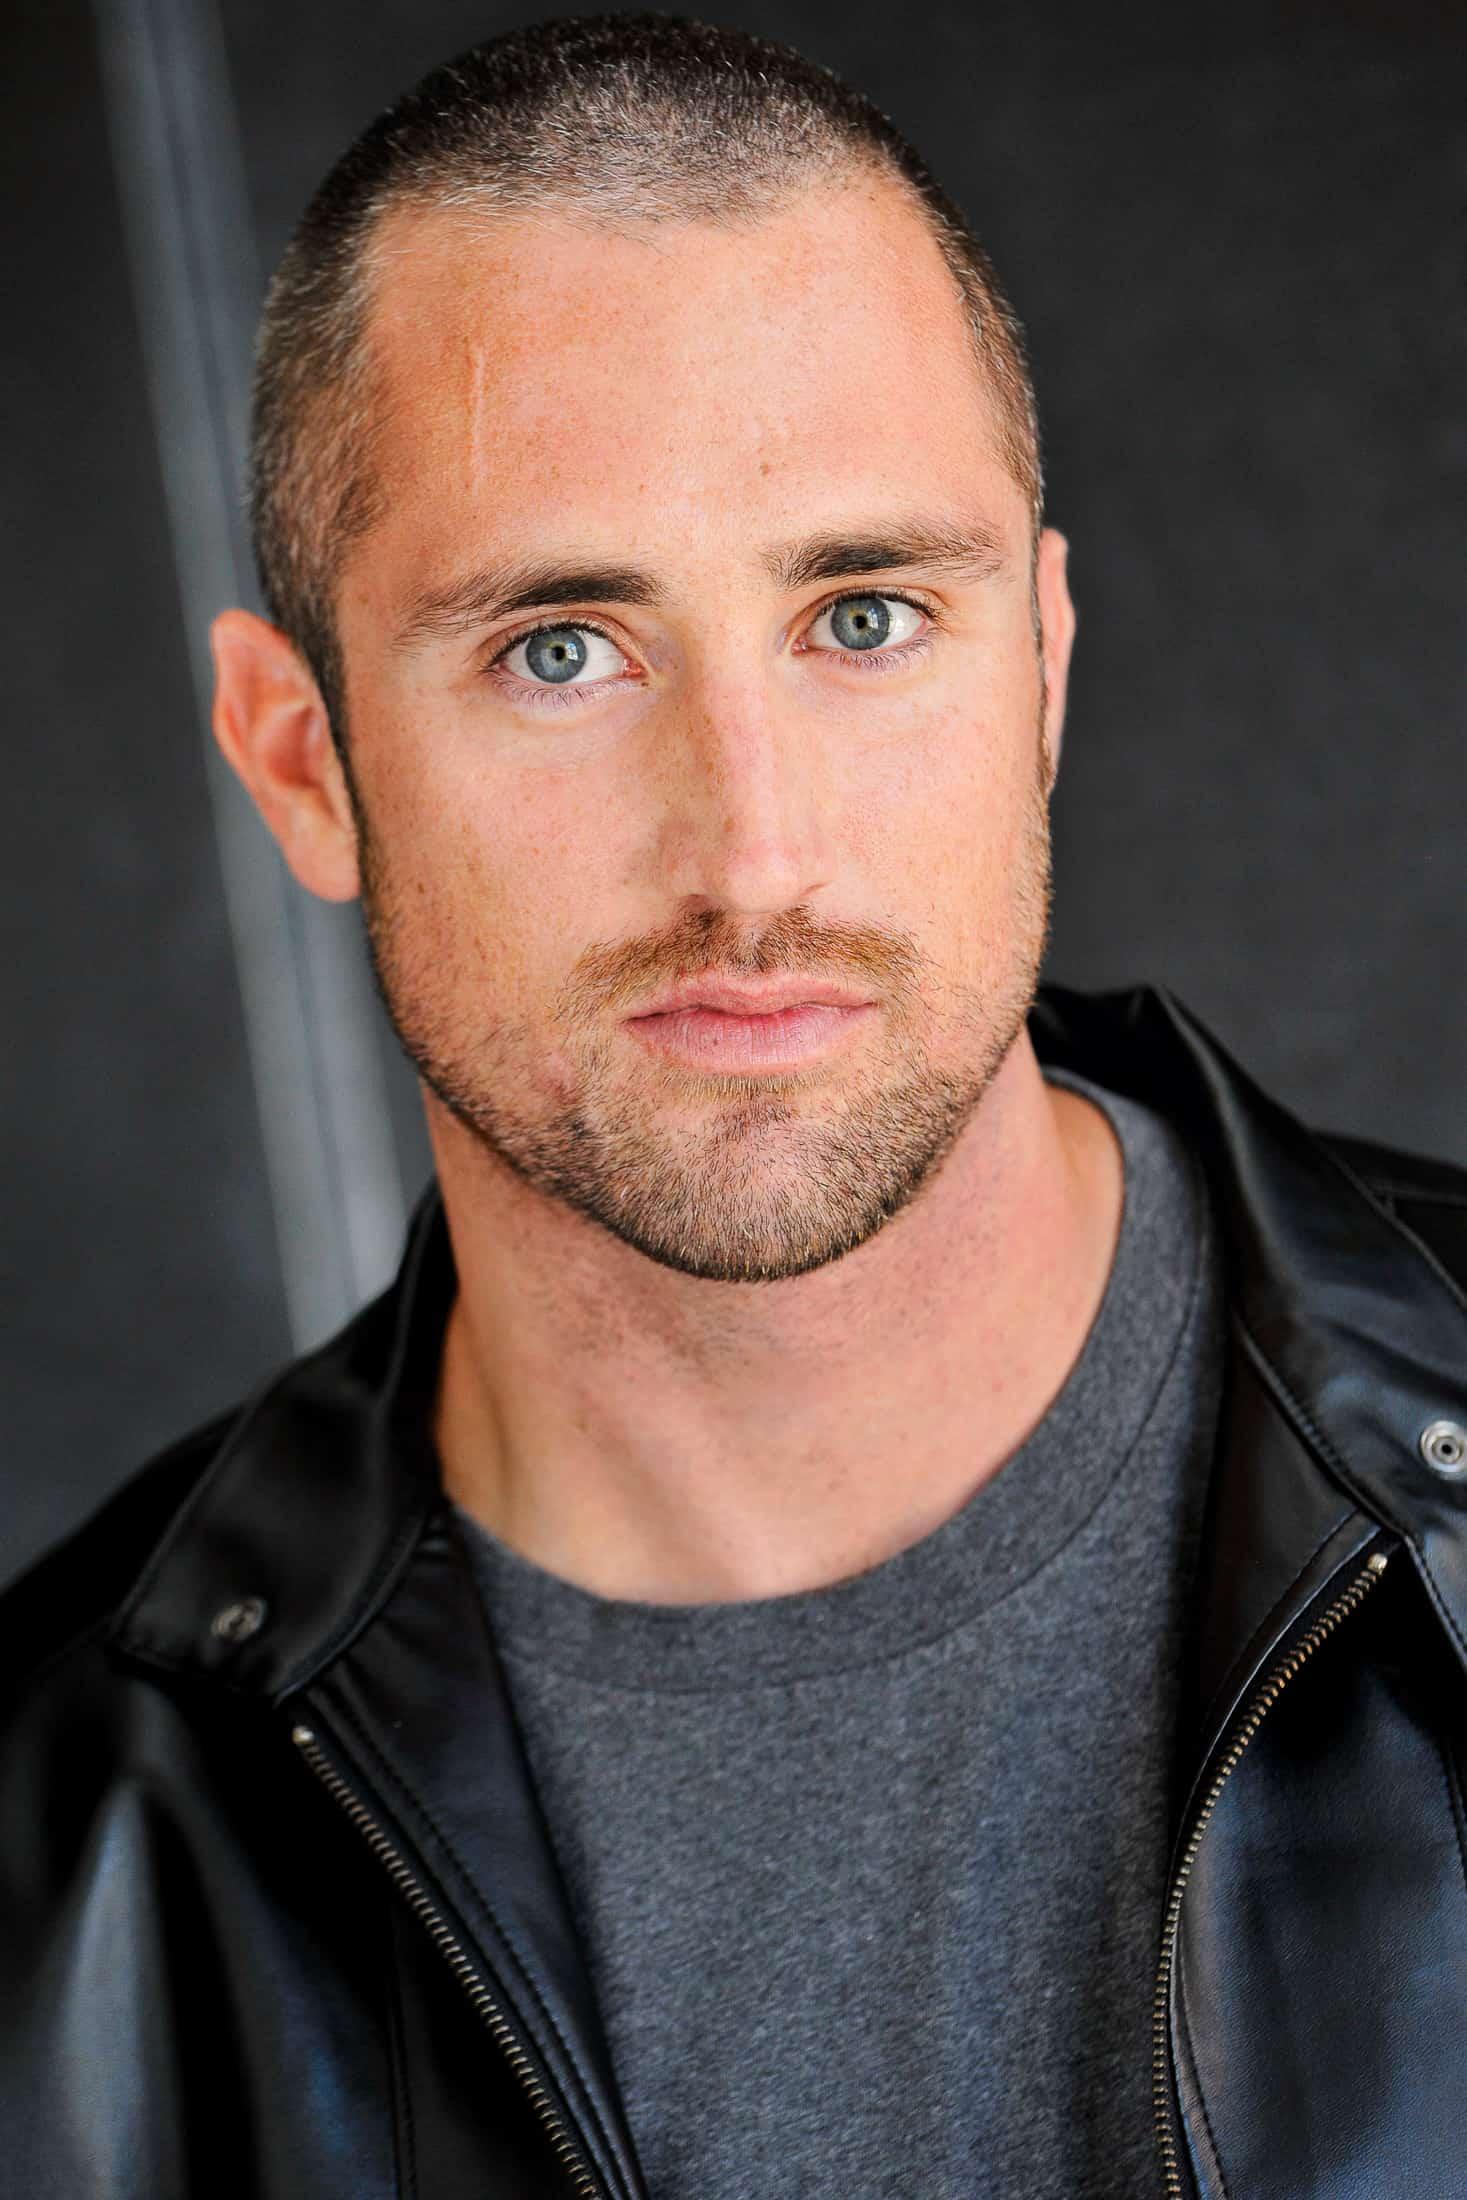 Headshots NYC - Actor Headshots Justin C